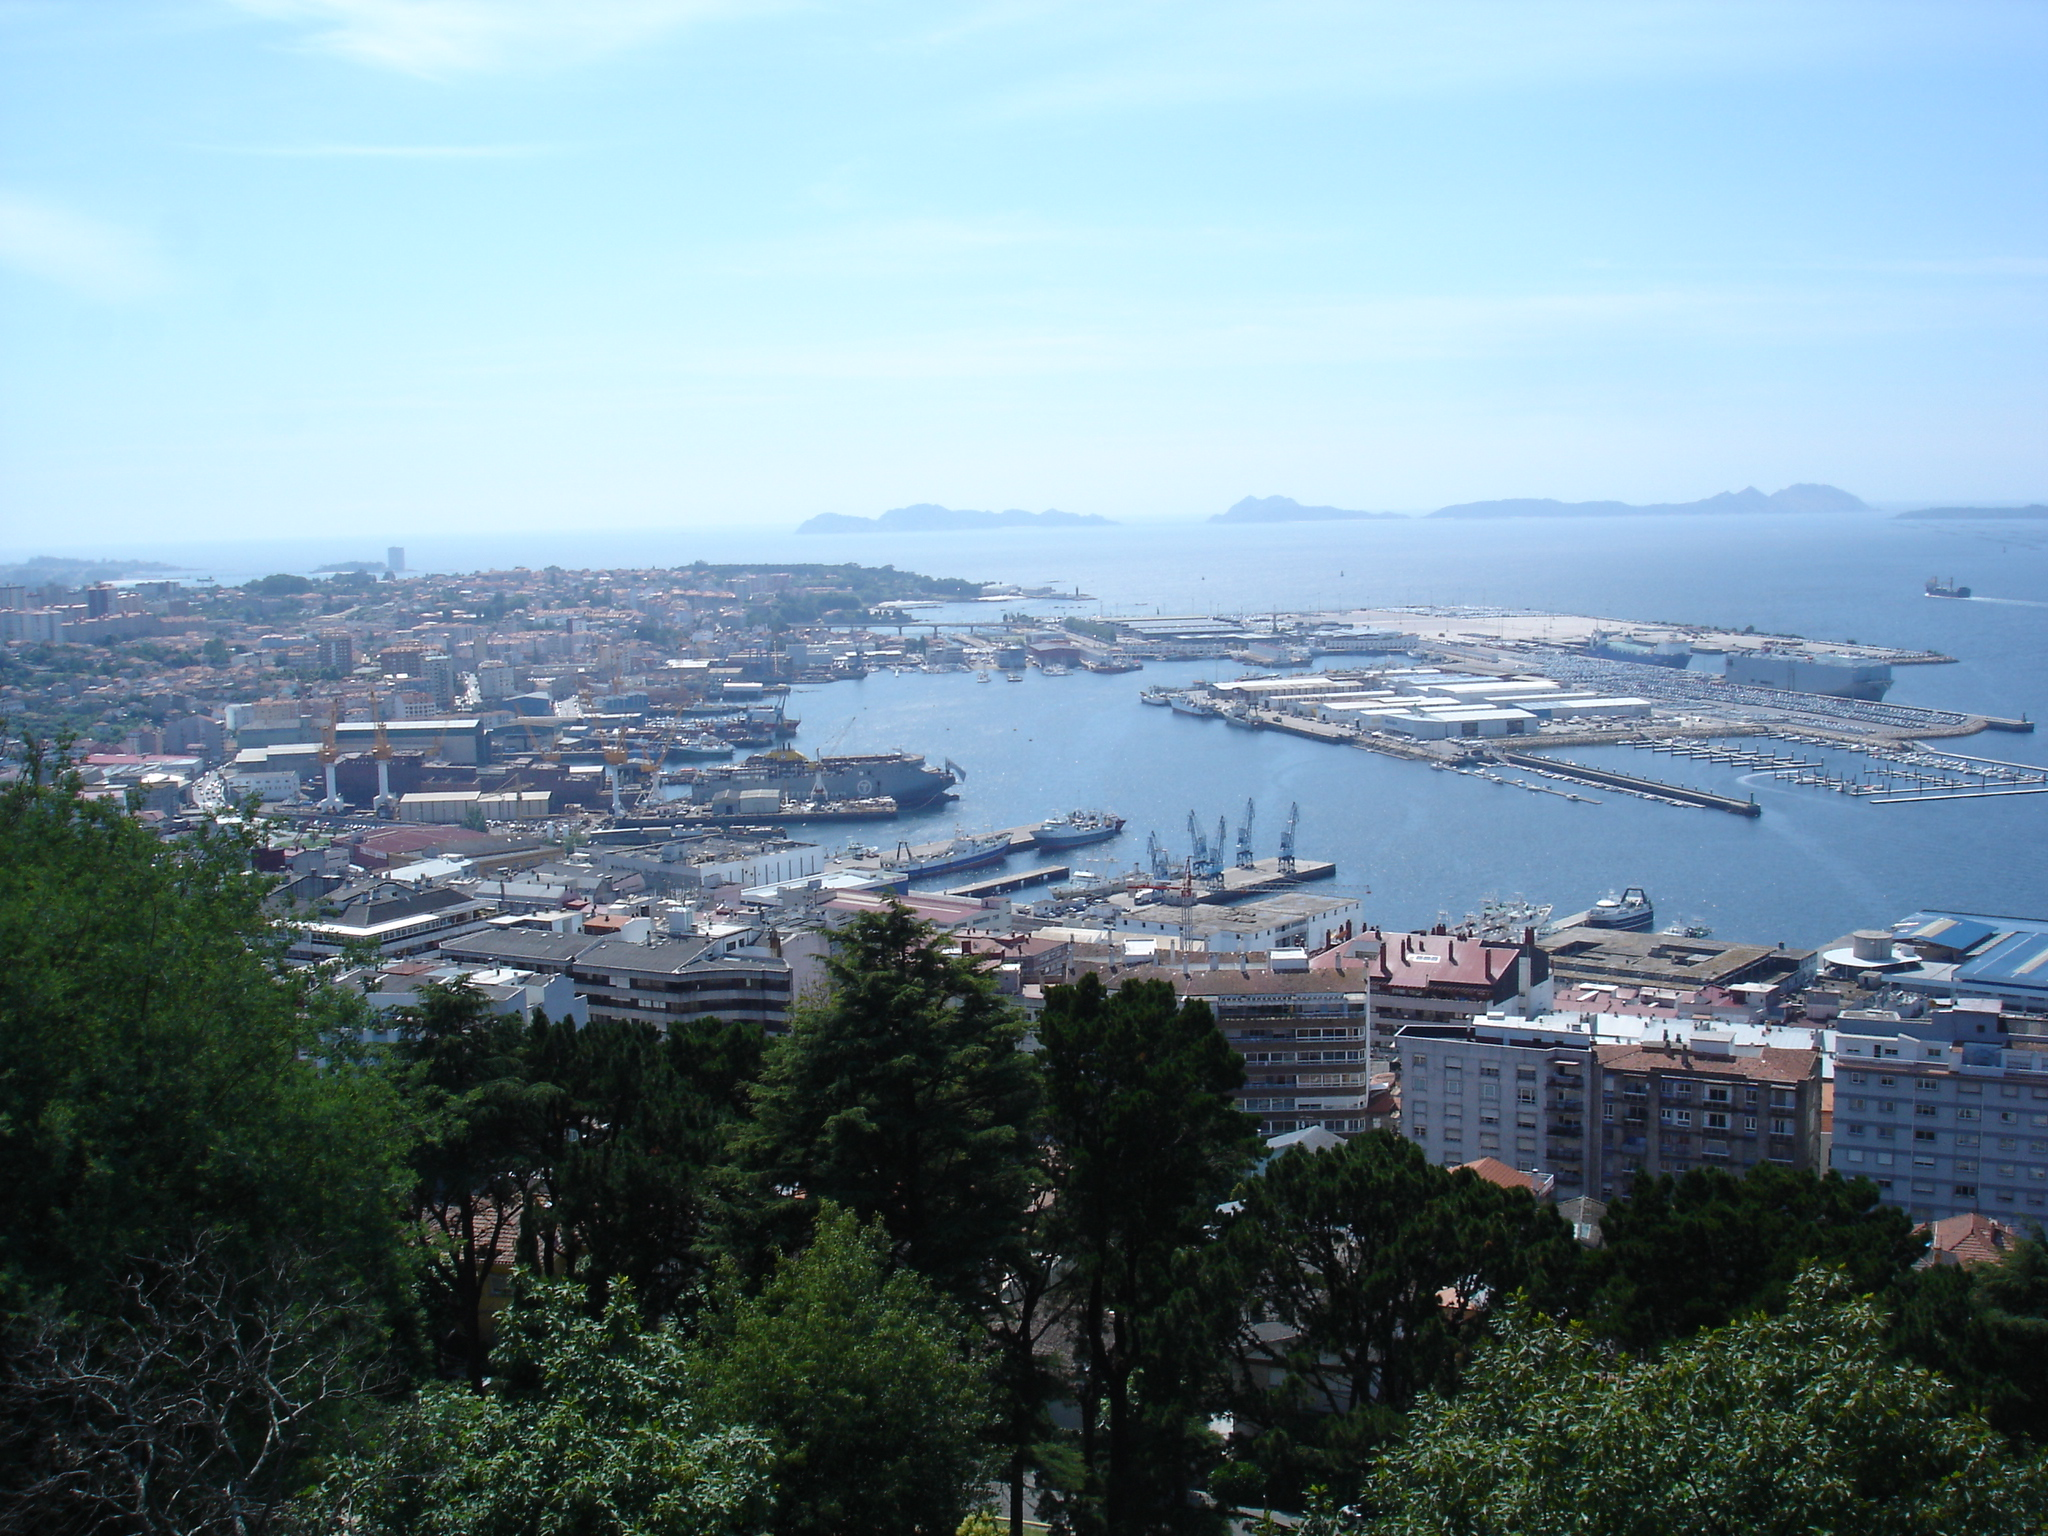 Wilayah Pontevedra